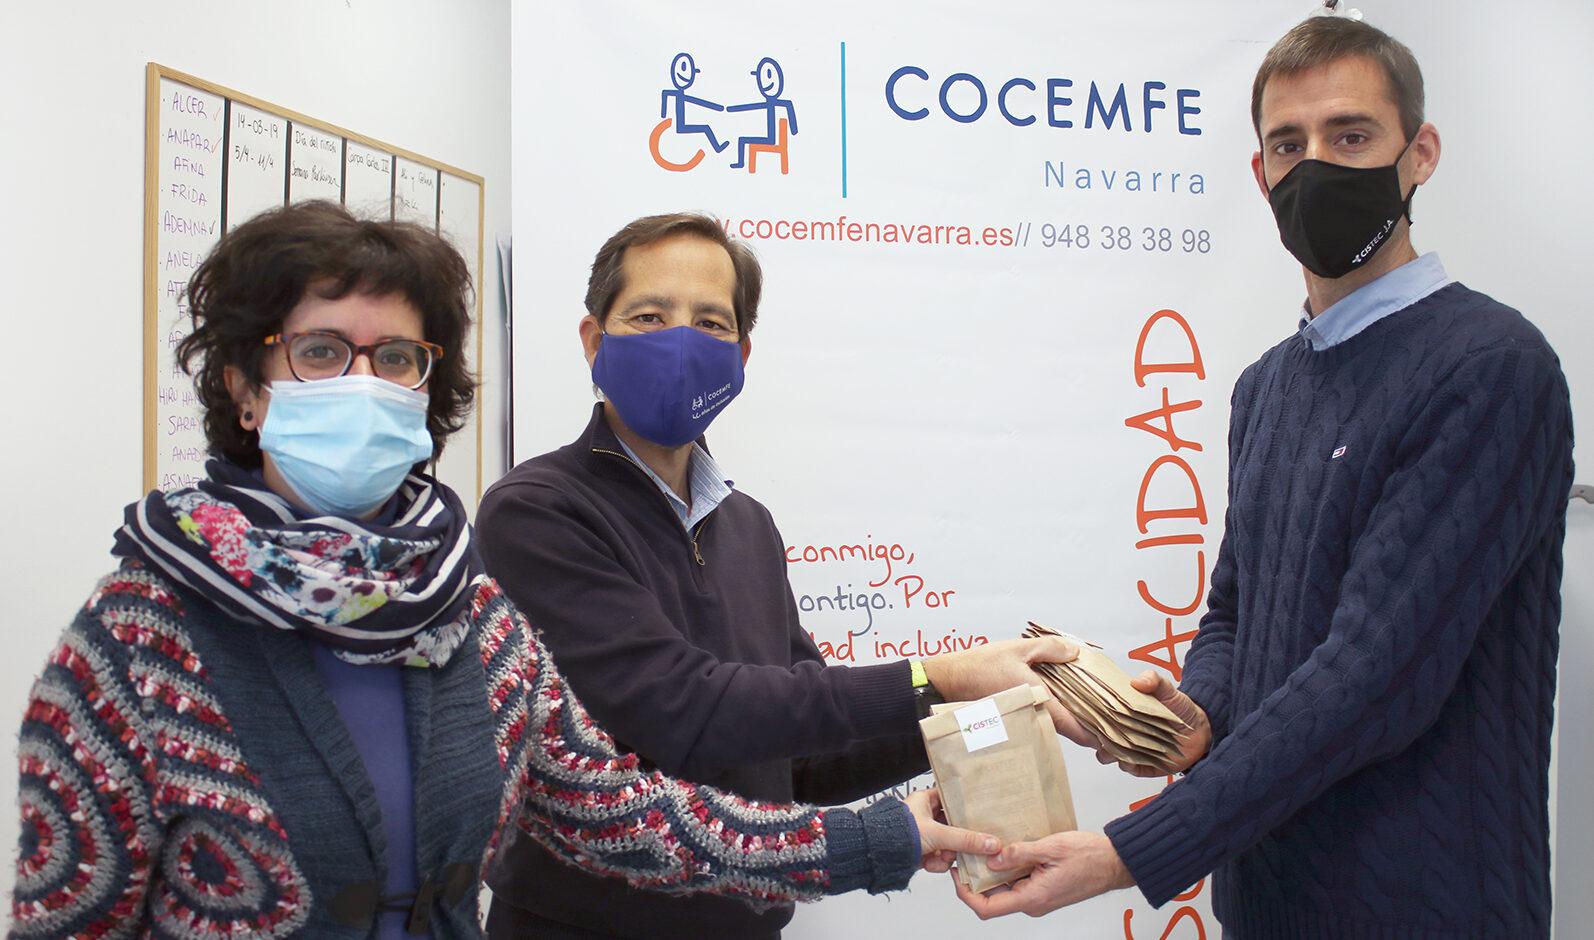 cistec cocemfe e1612168654121 - Cistec Technology promueve un acto solidario con asociaciones sin ánimo de lucro